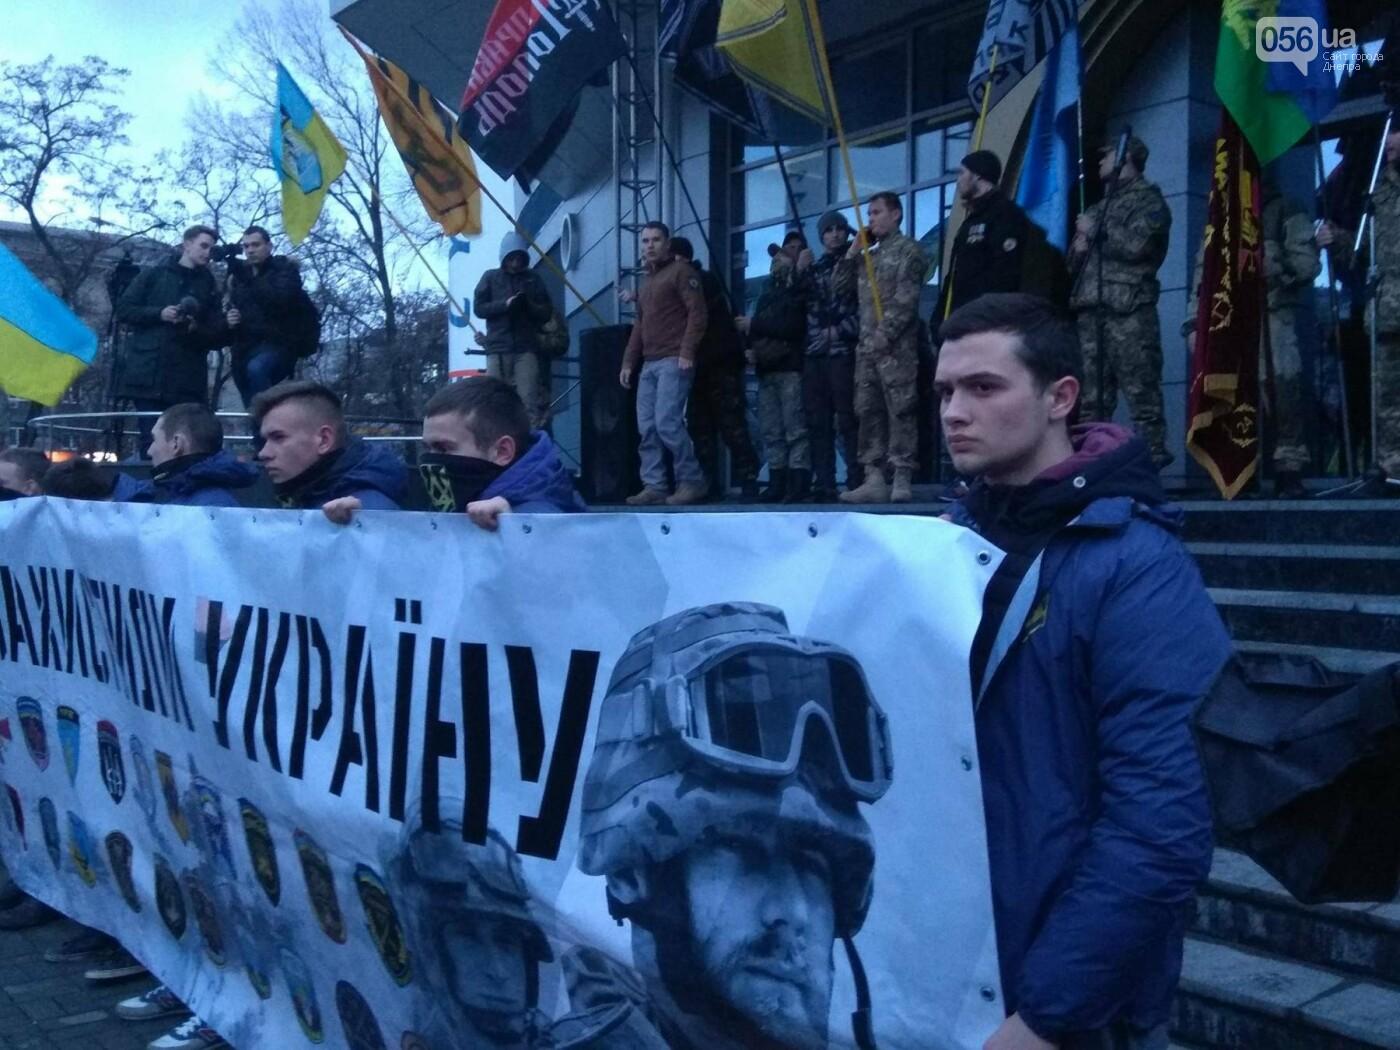 В центре Днепра прошла колонна добровольцев АТО (ФОТО, ВИДЕО), фото-10